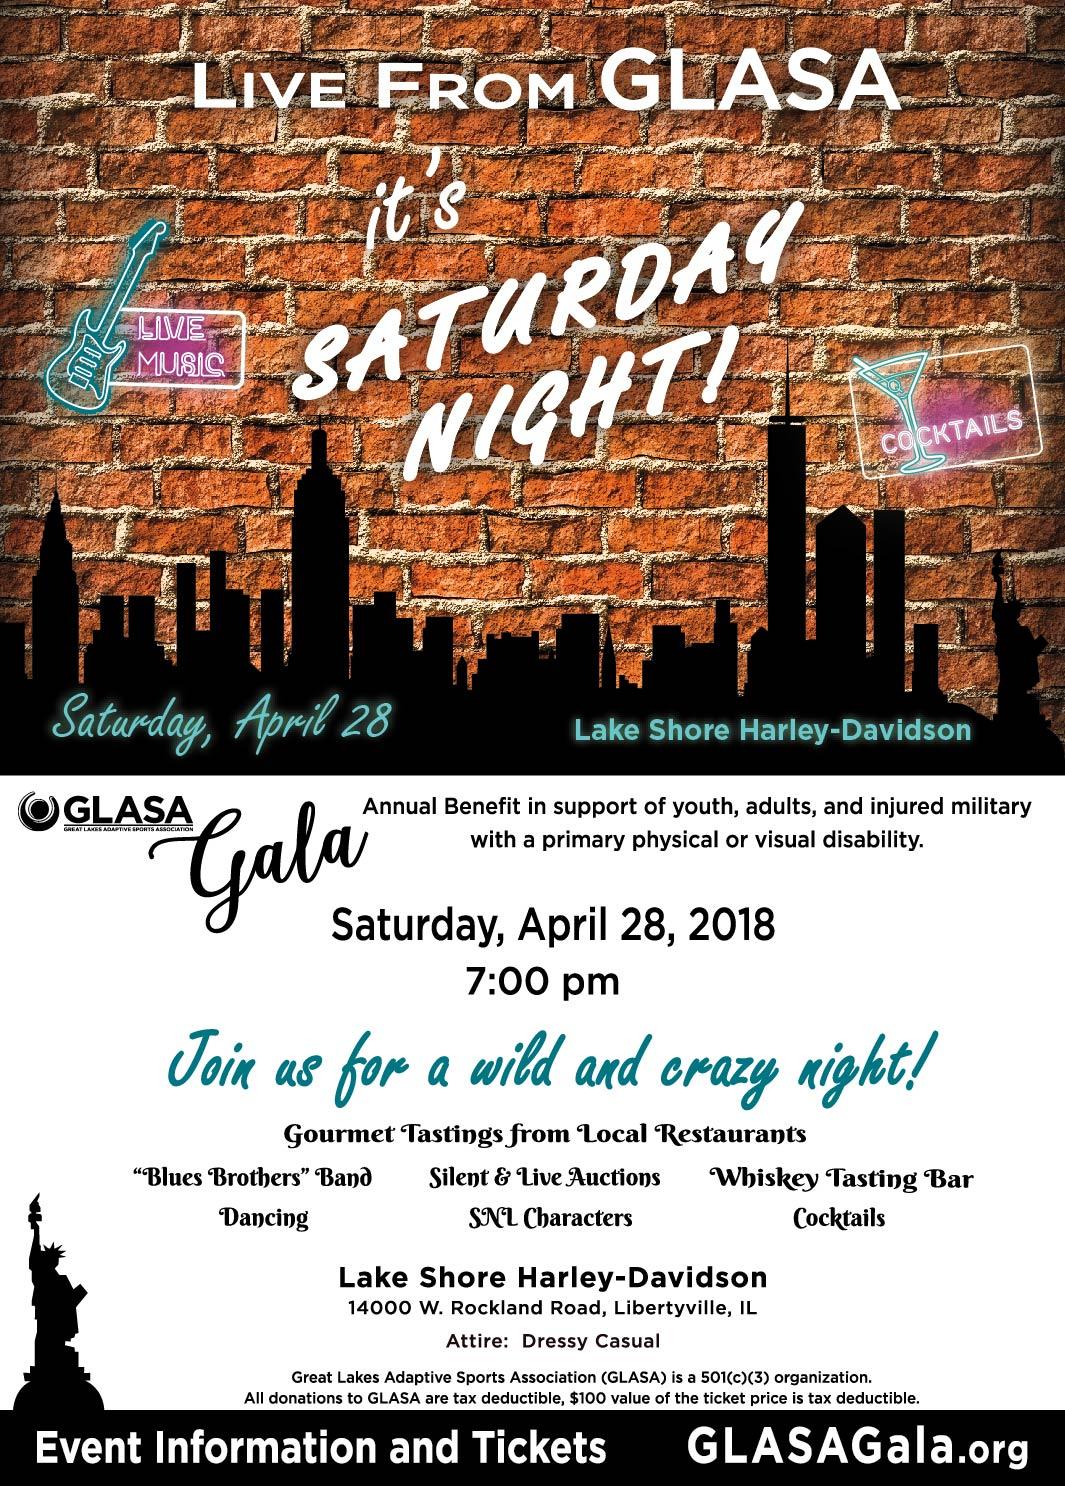 2018 GLASA Gala @ Lake Shore Harley Davidson | Libertyville | Illinois | United States